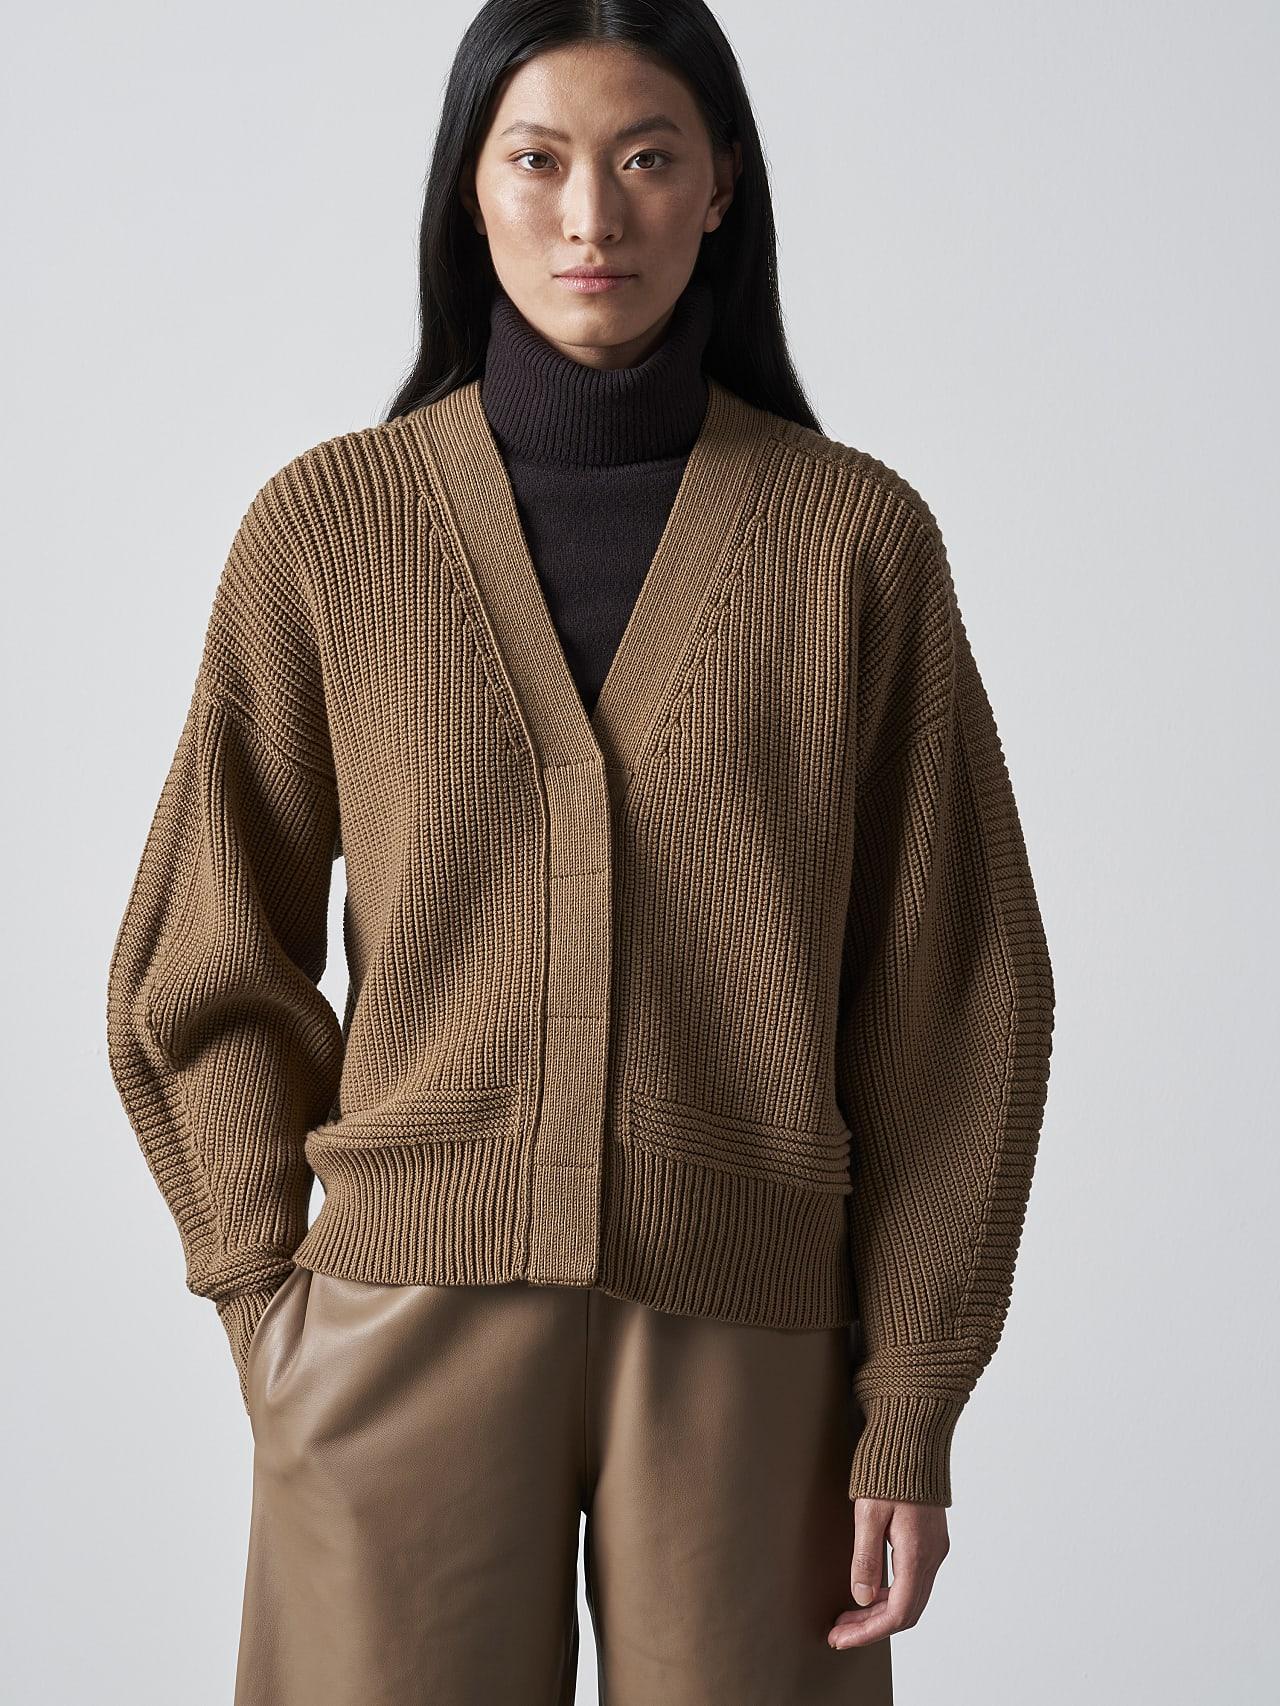 FREDA V1.Y5.02 Chunky Merino Wool Cardigan gold Model shot Alpha Tauri